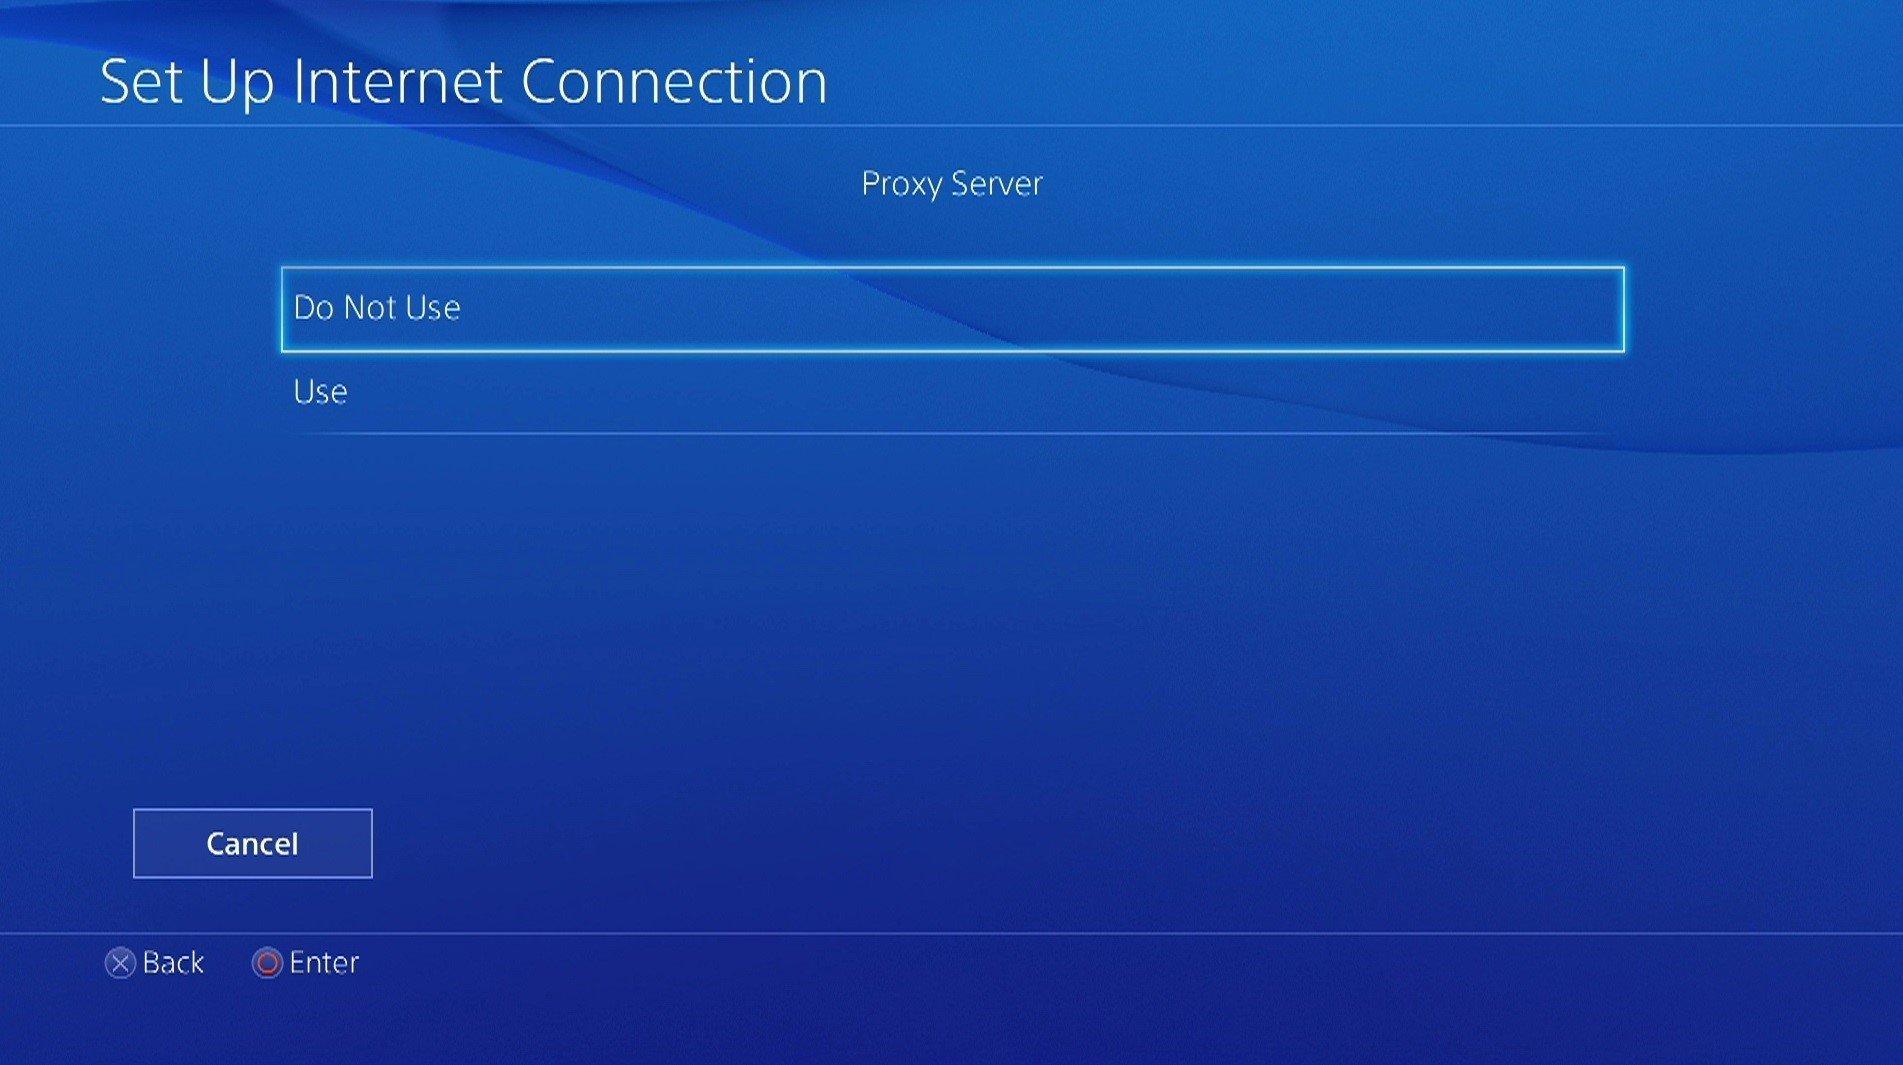 ps4 proxy server settings